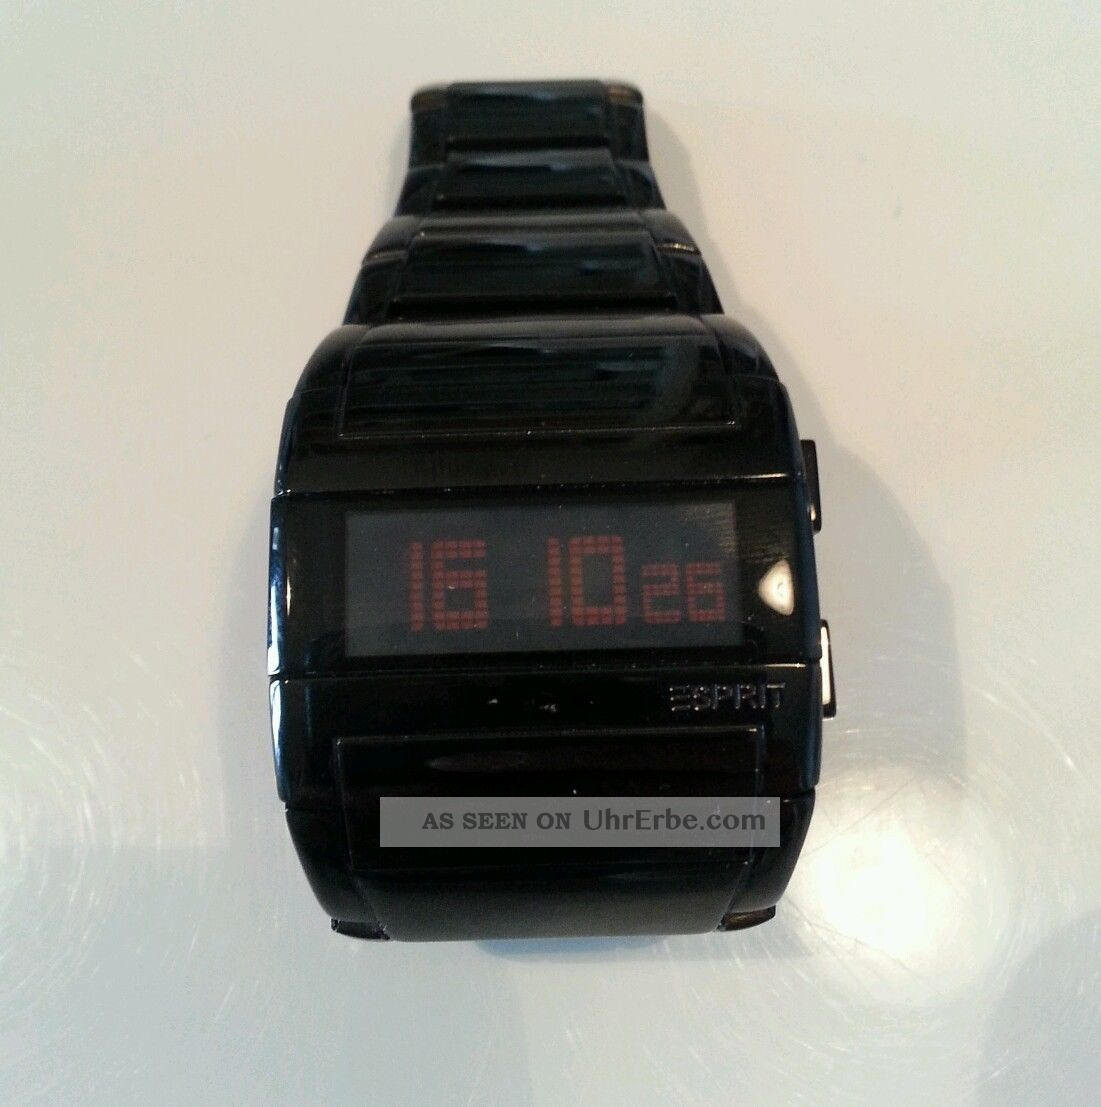 Esprit Es102042002 Bash Night Damen - Uhr Herrenuhr Edelstahl Digital Schwarz Armbanduhren Bild